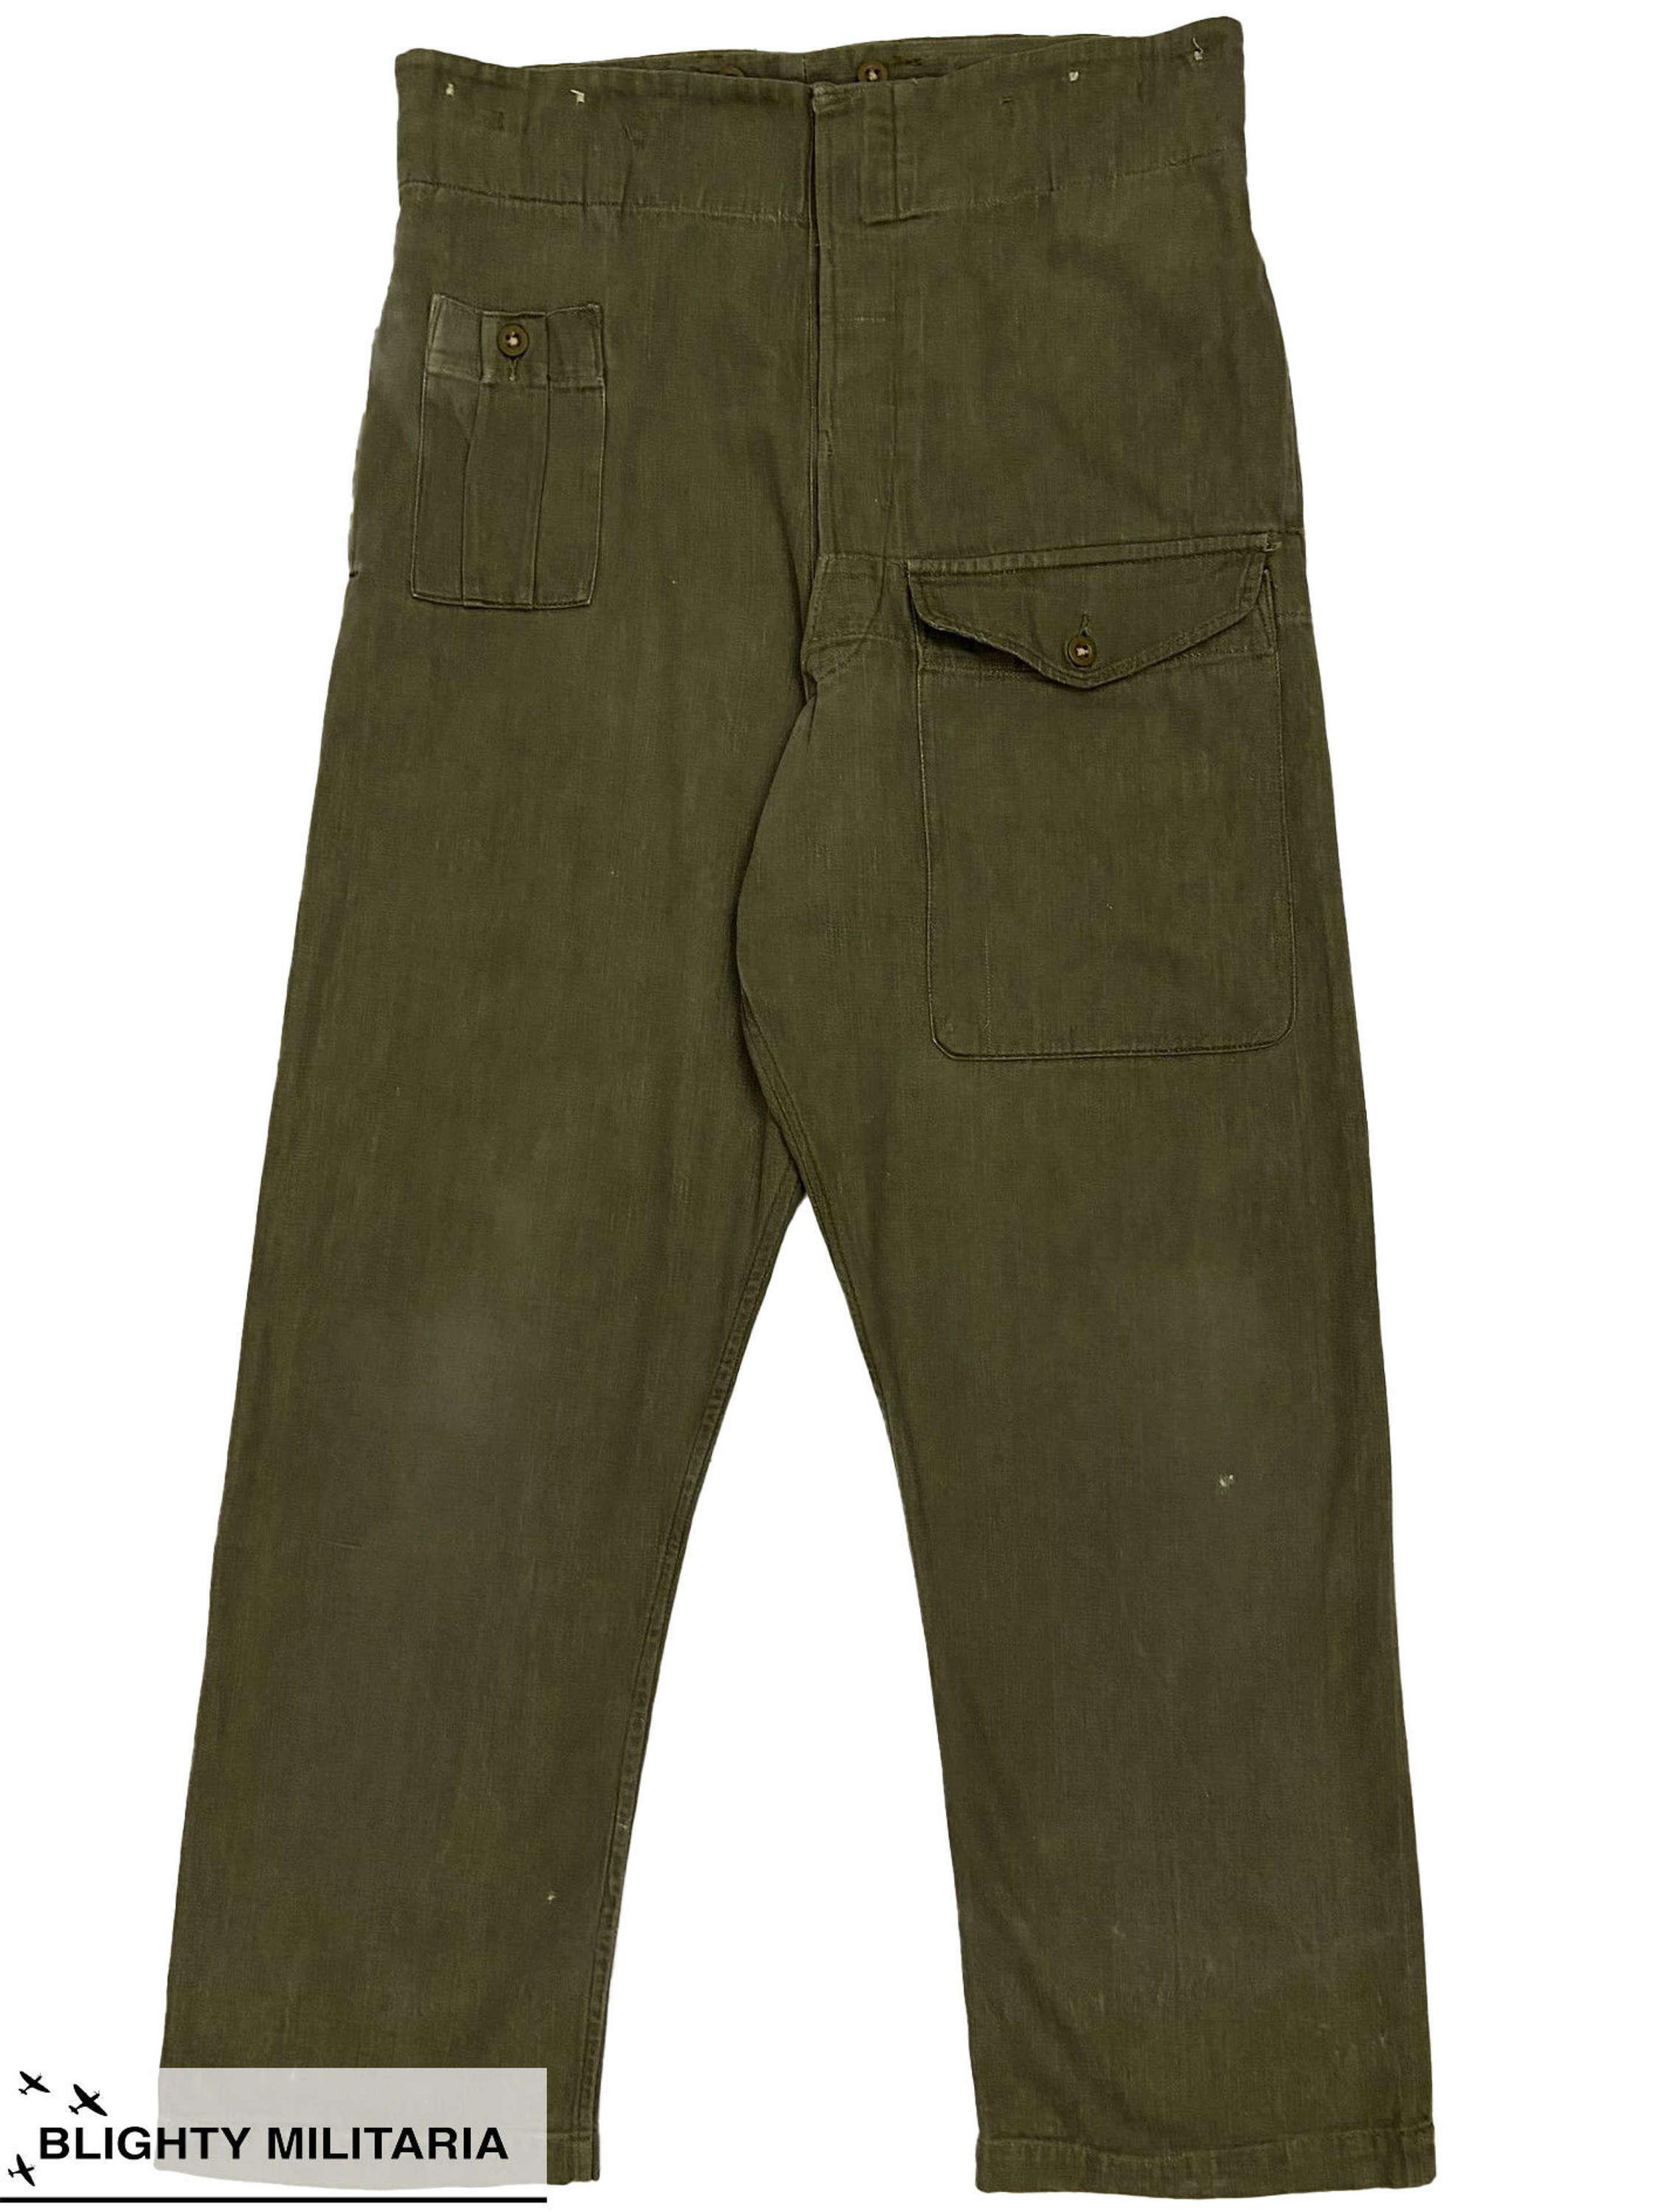 Original 1952 Dated British Army Denim Battledress Trousers - Size 9